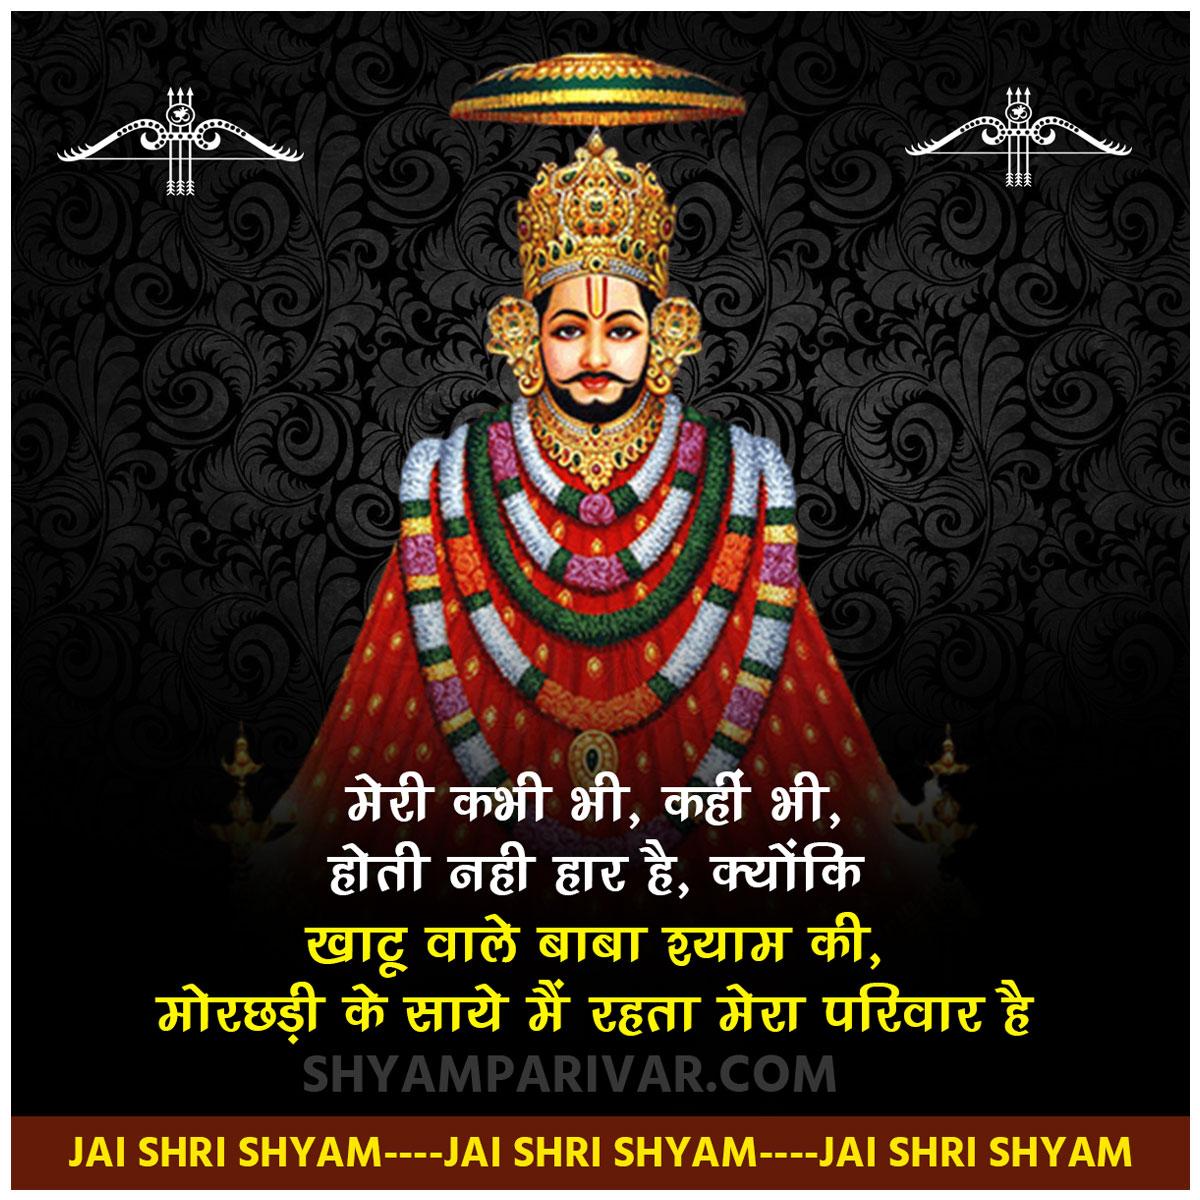 Khatu Shyam Ji Status Photos for Whatsapp